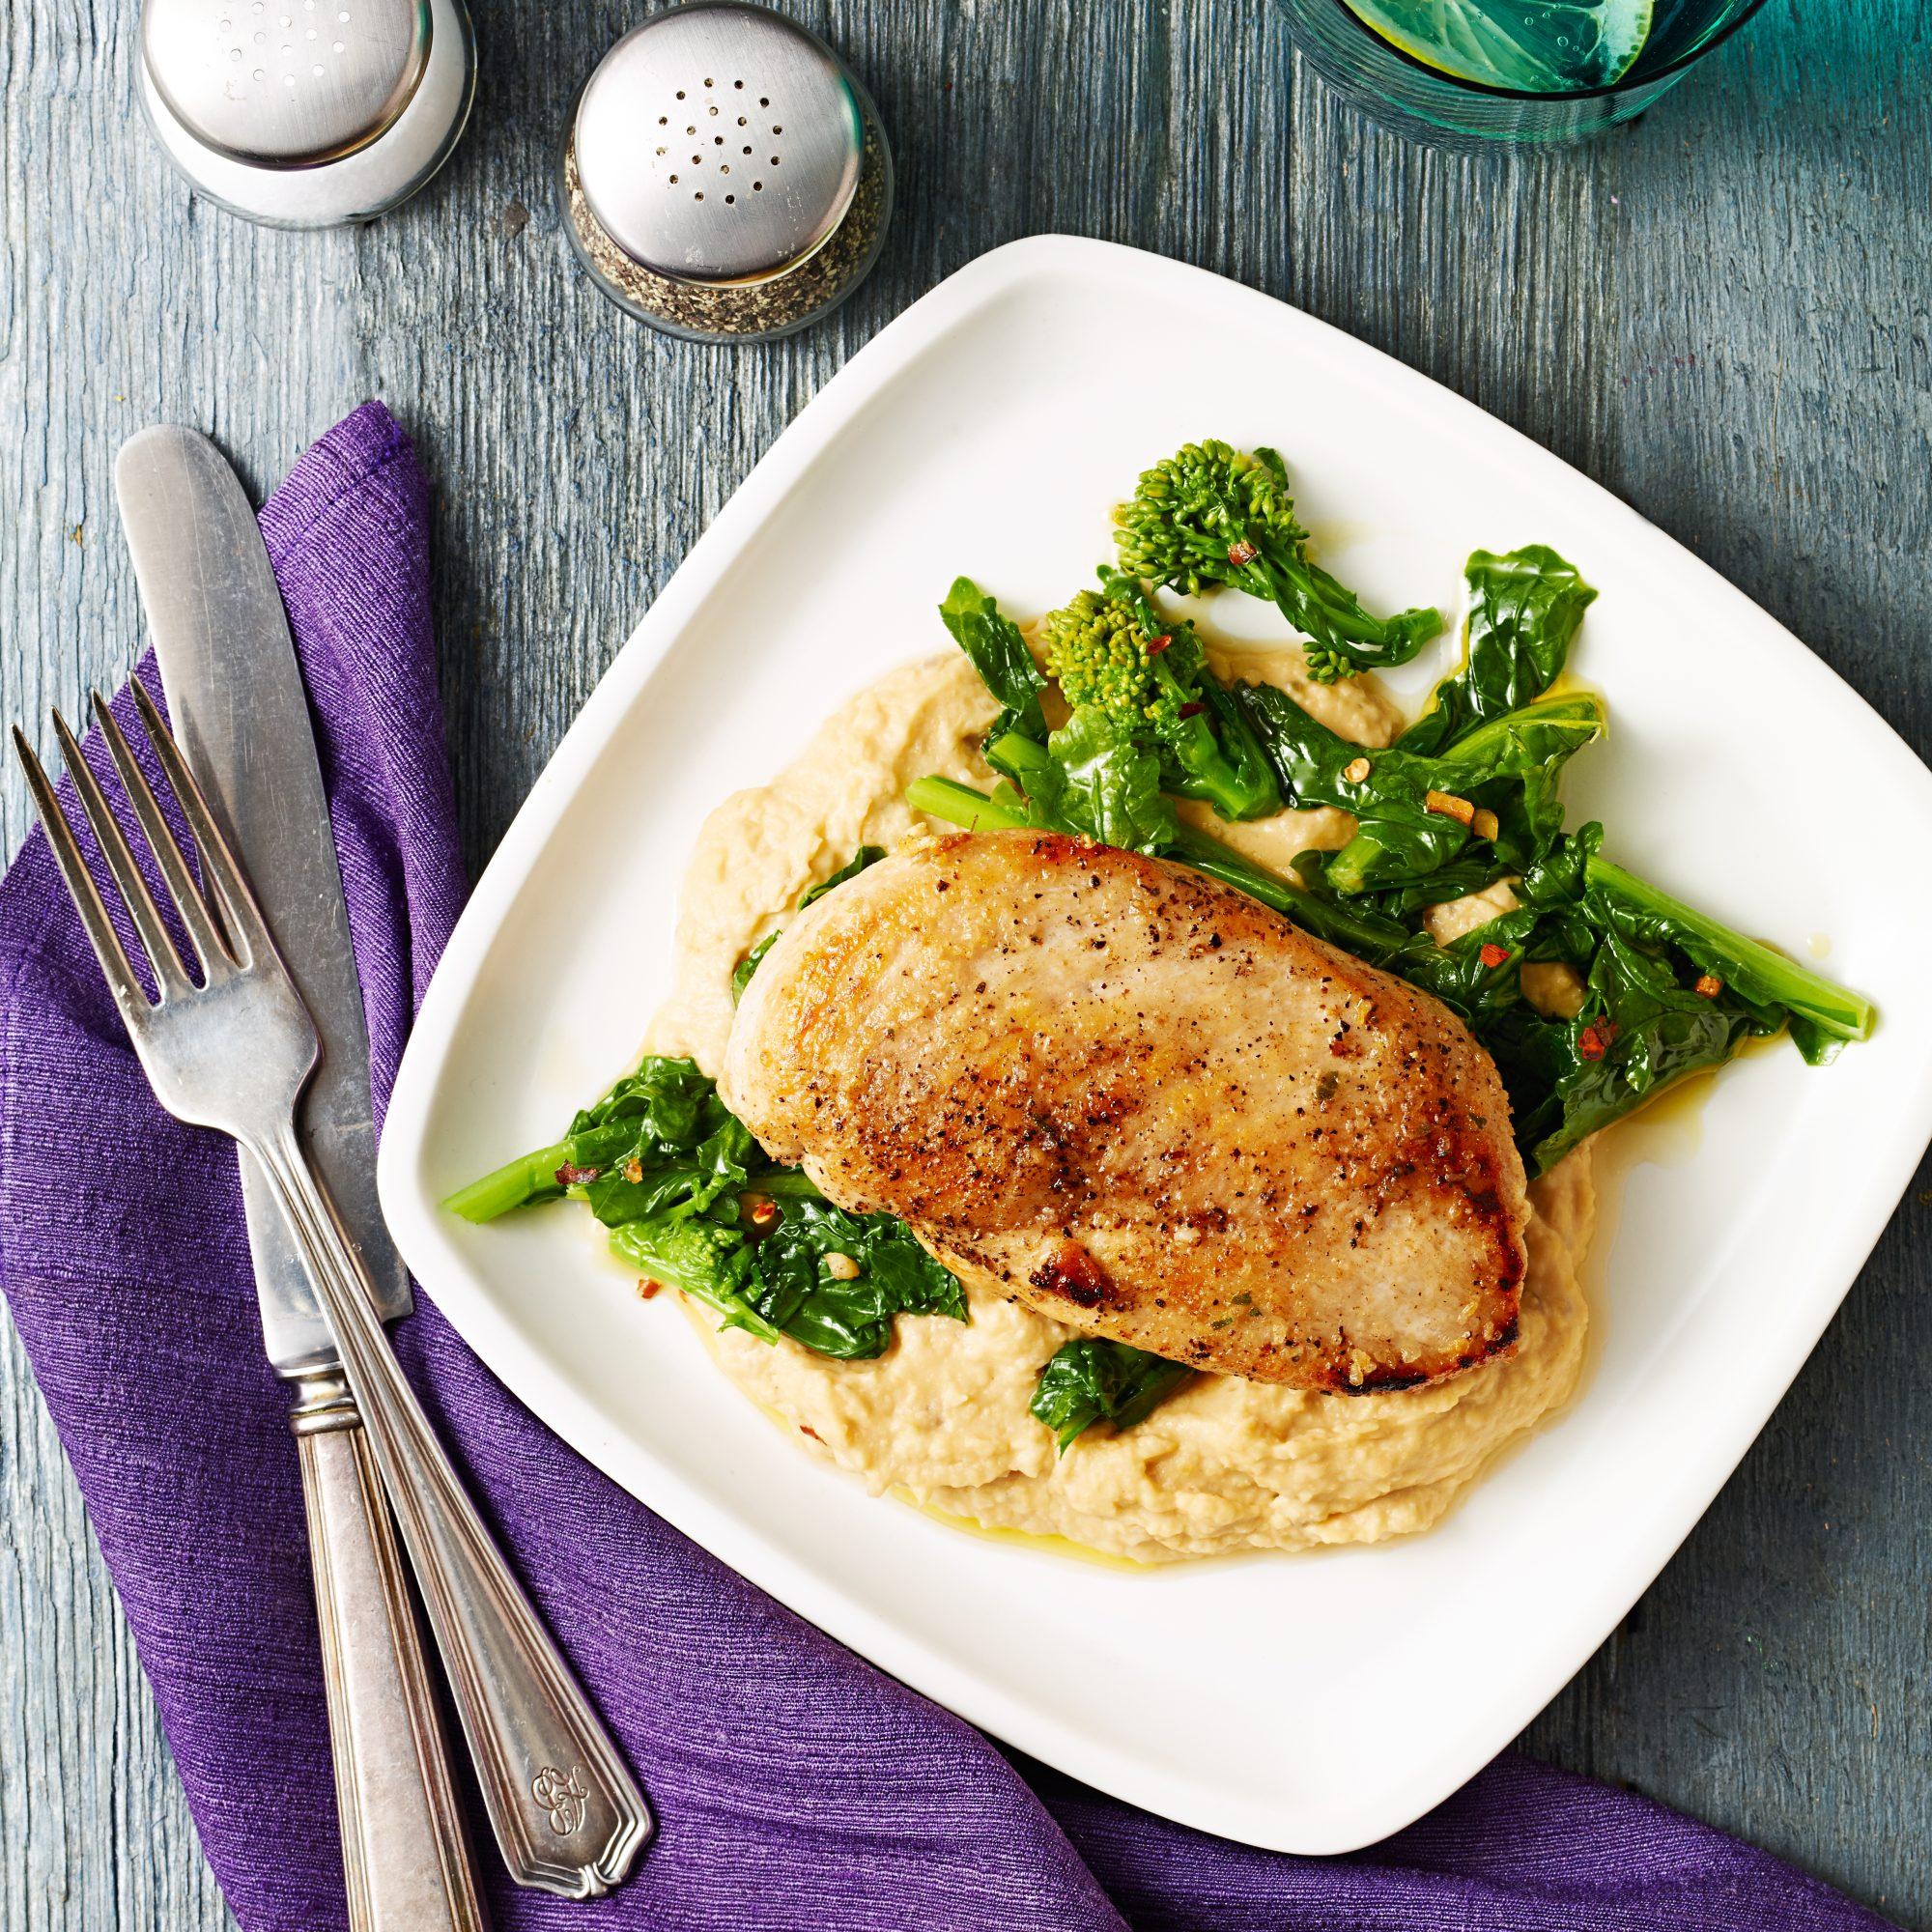 Oregano Chicken with Garlicky Broccoli Rabe